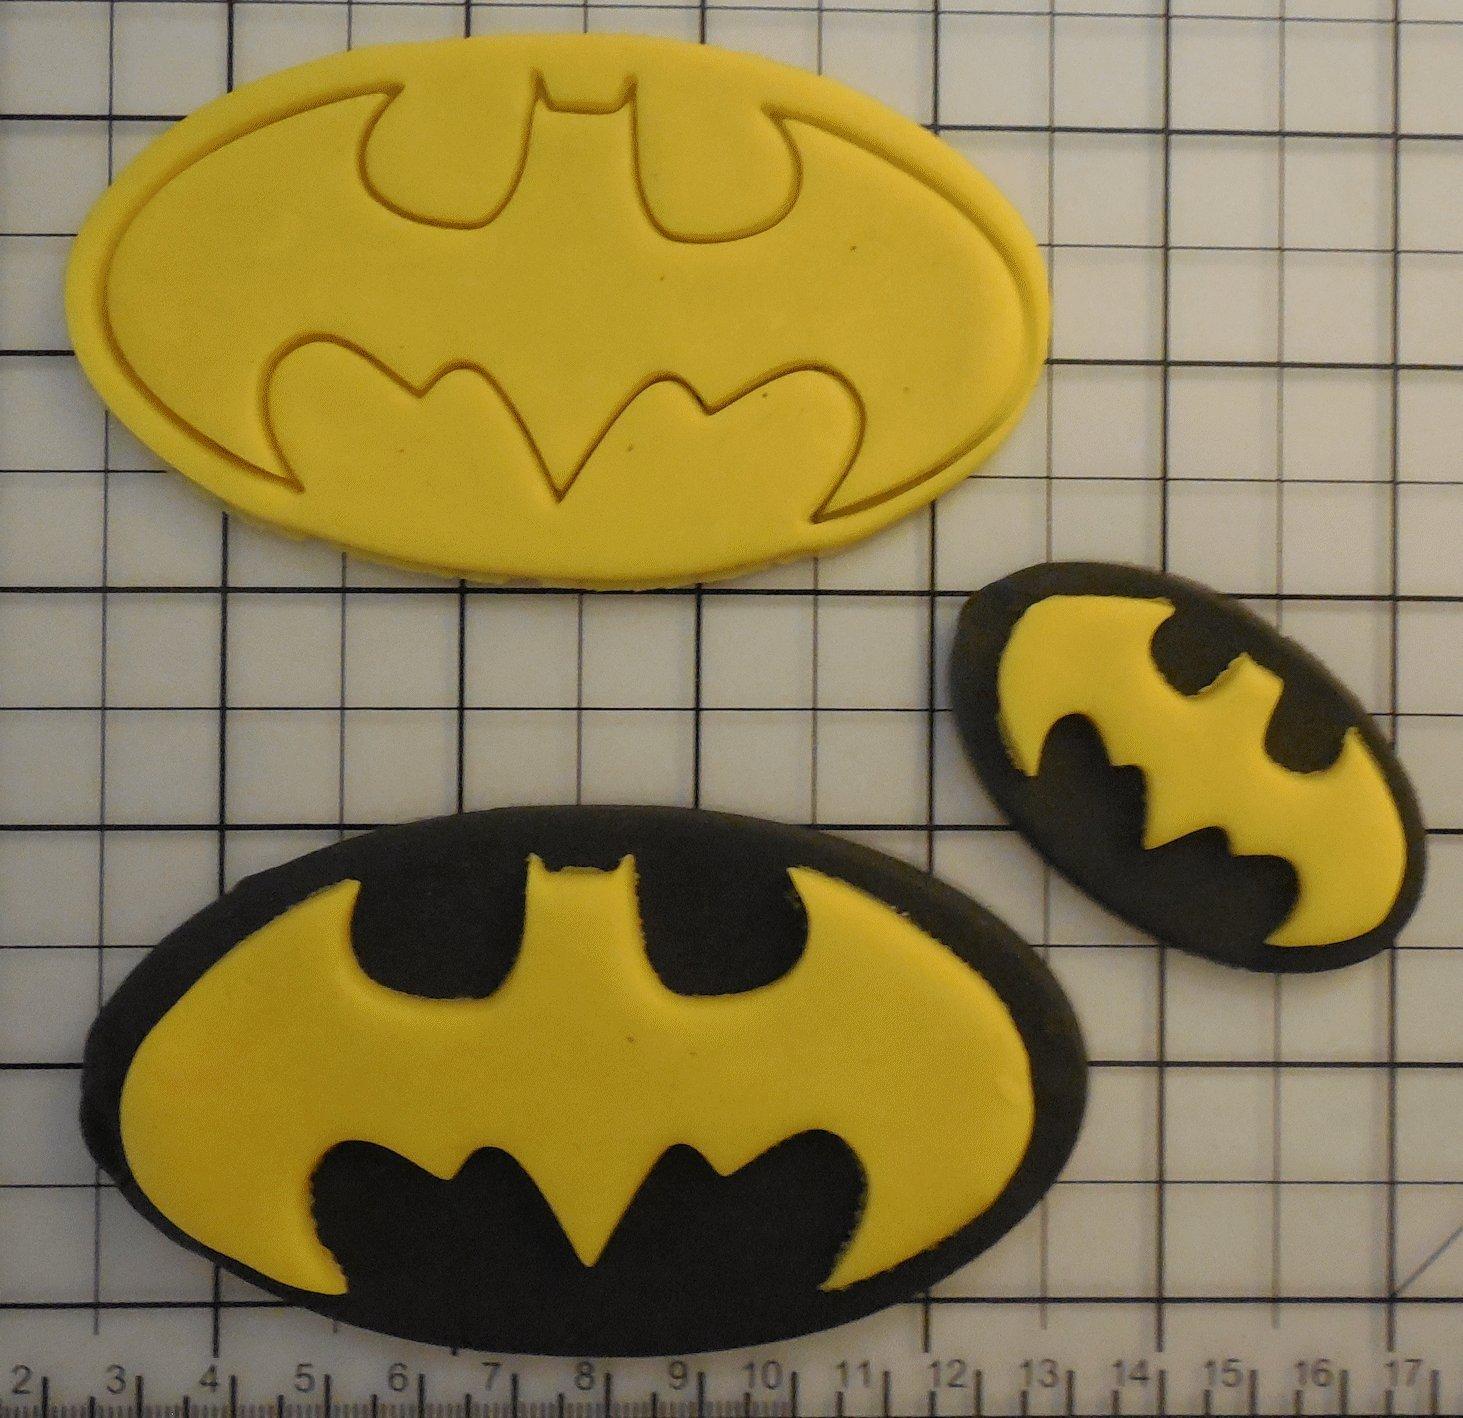 Goggly Batman Platzchen Ausstechform Amazon De Kuche Haushalt